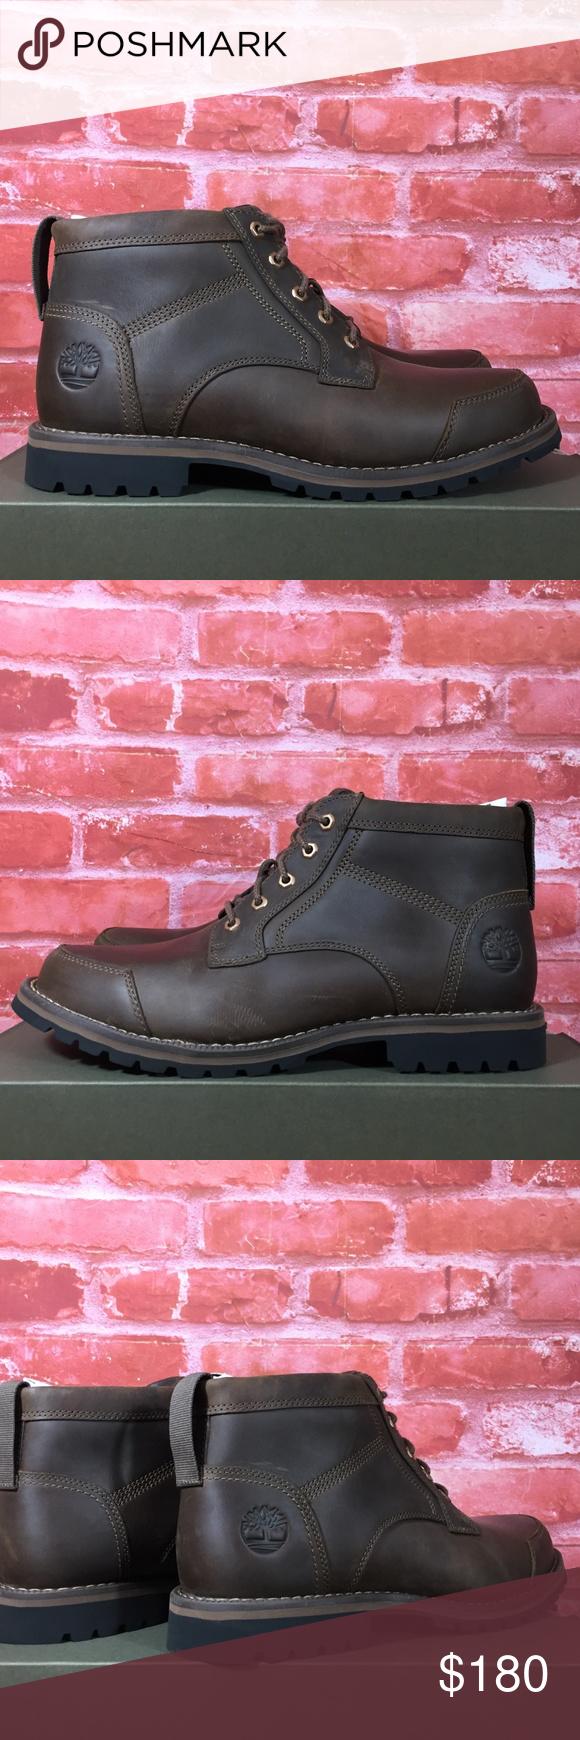 tobillo Hacia atrás temperatura  TIMBERLAND MEN'S LARCHMONT CHUKKA BOOTS DARK BROWN | Chukka boots, Timberland  mens, Boots men